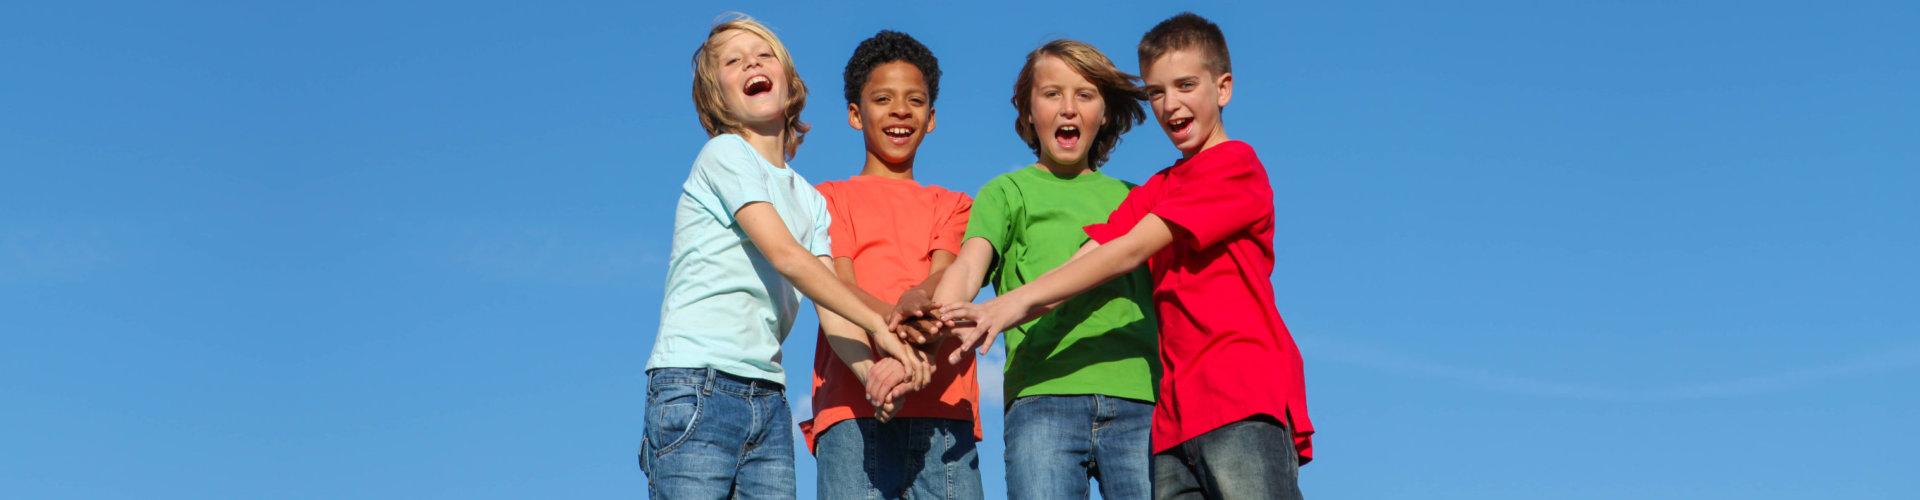 Group of diverse kids or teens hands together